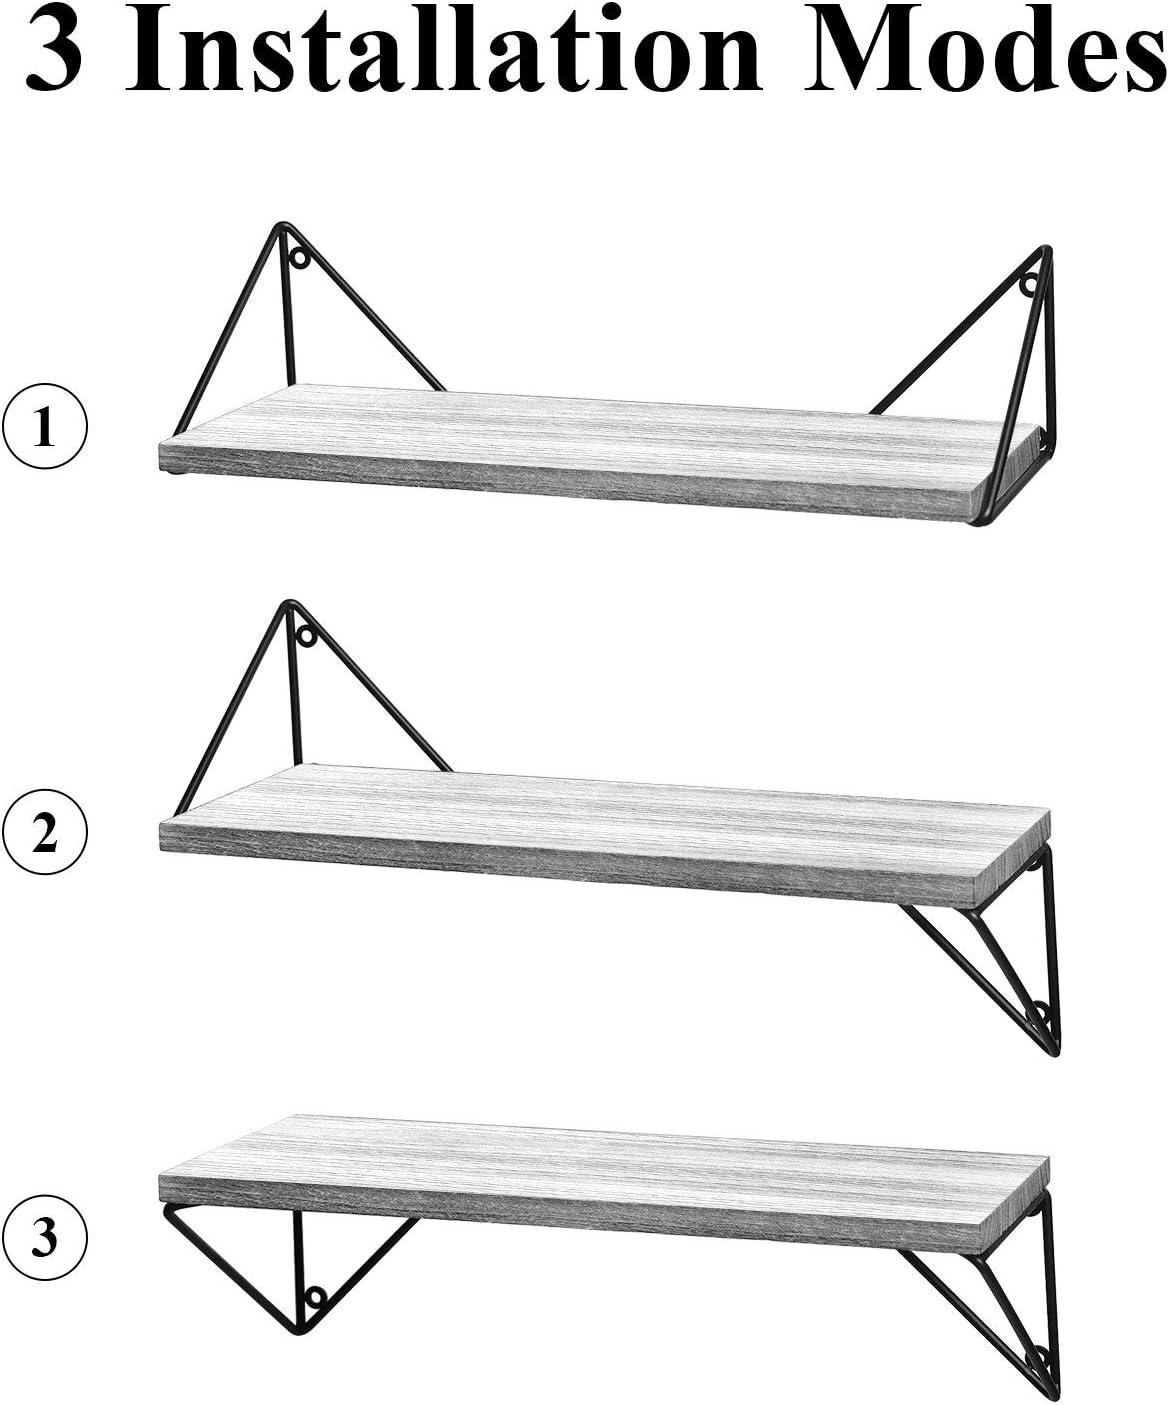 BAYKA Floating Shelves Wall Mounted Set of 3, Rustic Wood Wall Shelves for Living Room, Bedroom, Bathroom Gray: Home & Kitchen